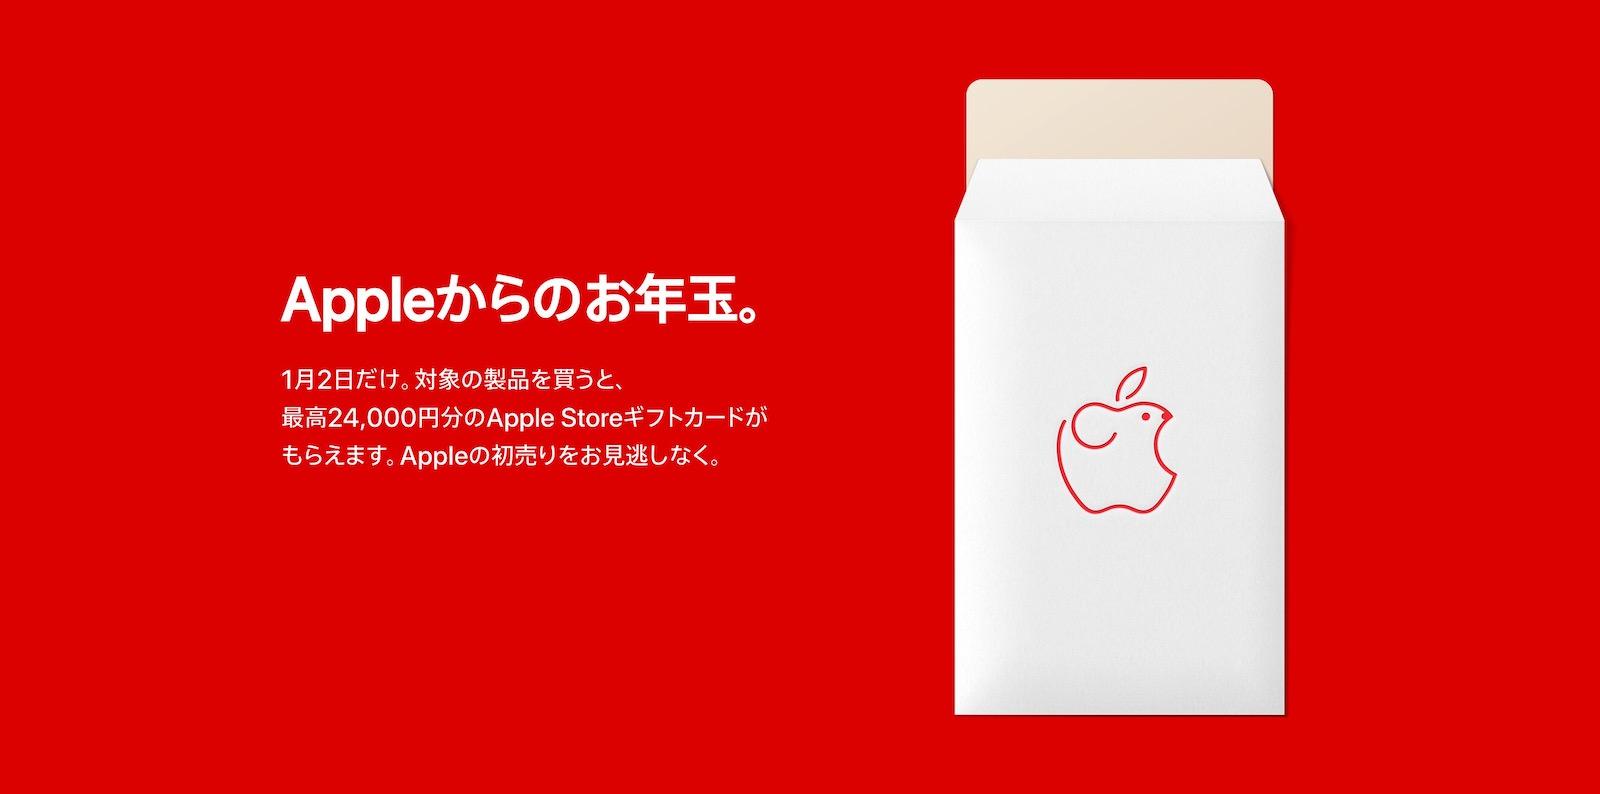 Apple New Years Sale